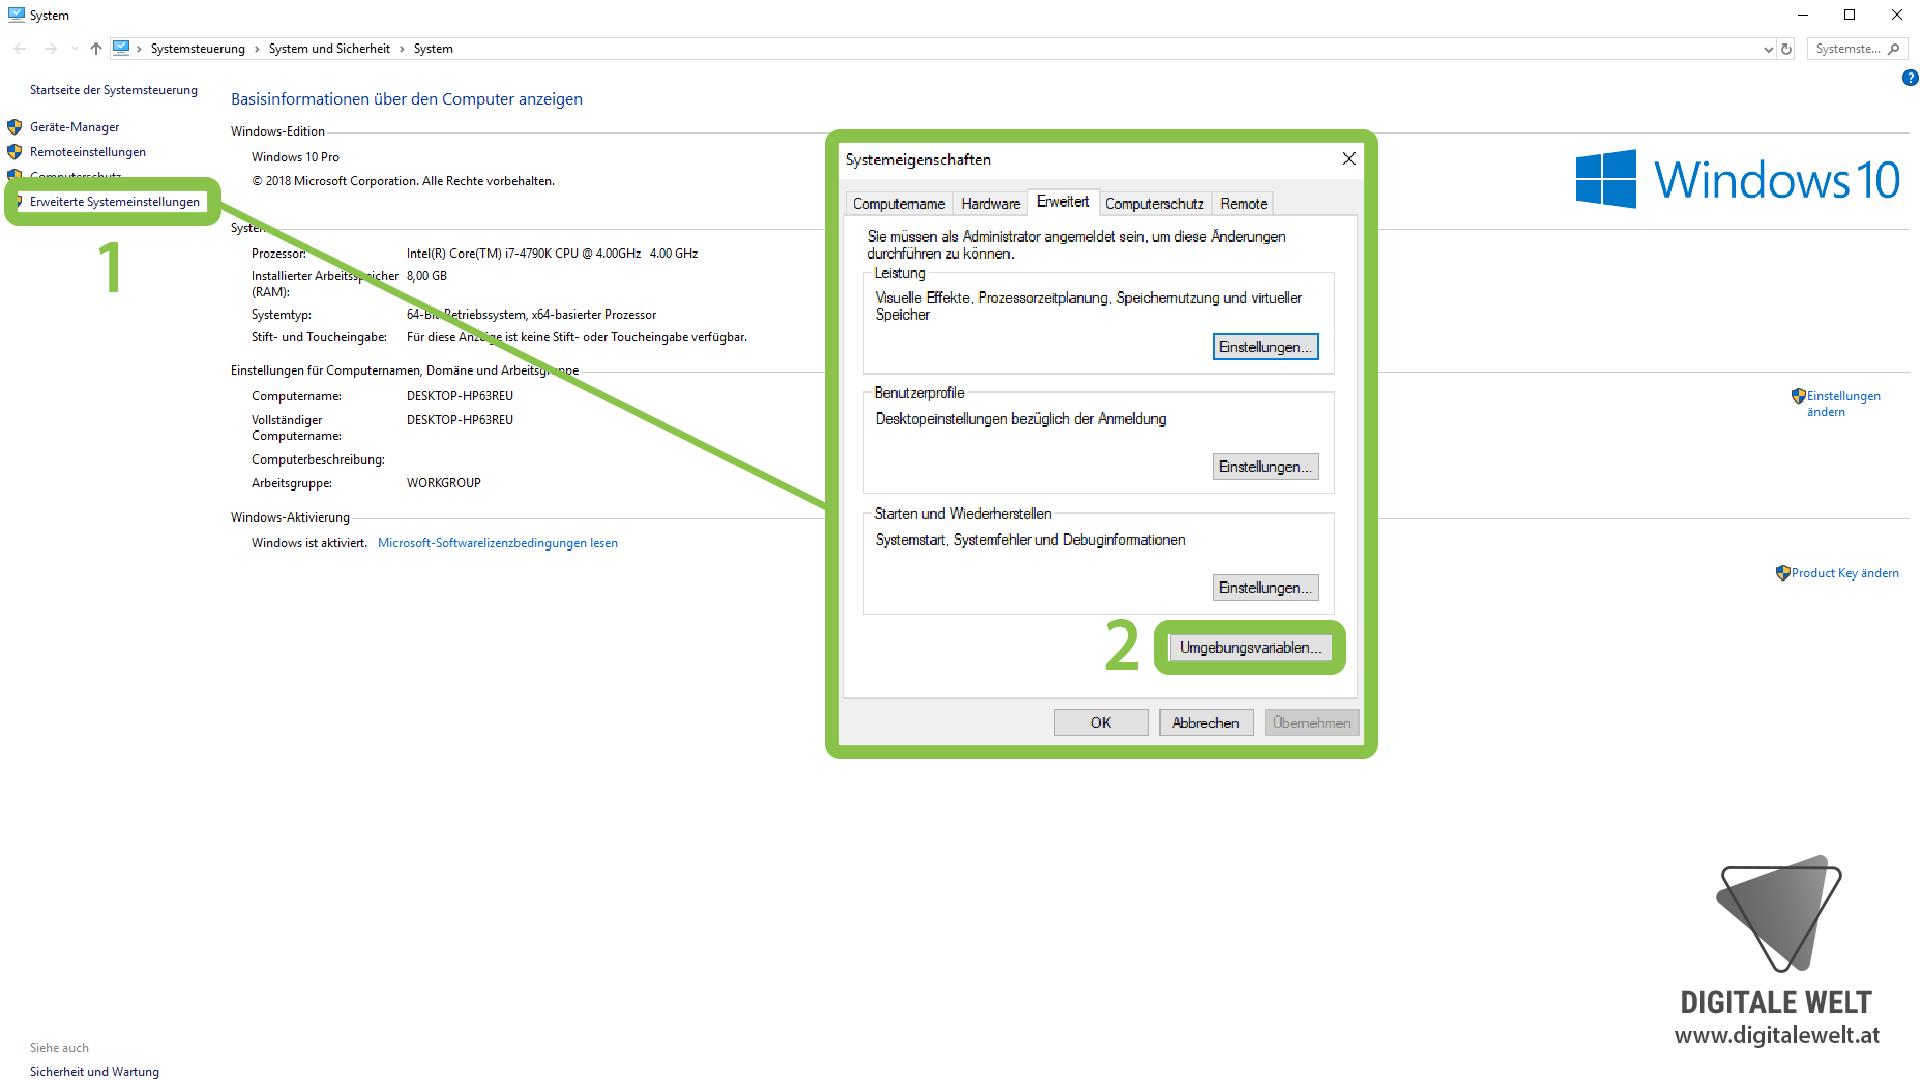 openHAB 2 Windows - System Umgebungsvariablen (DigitaleWelt)